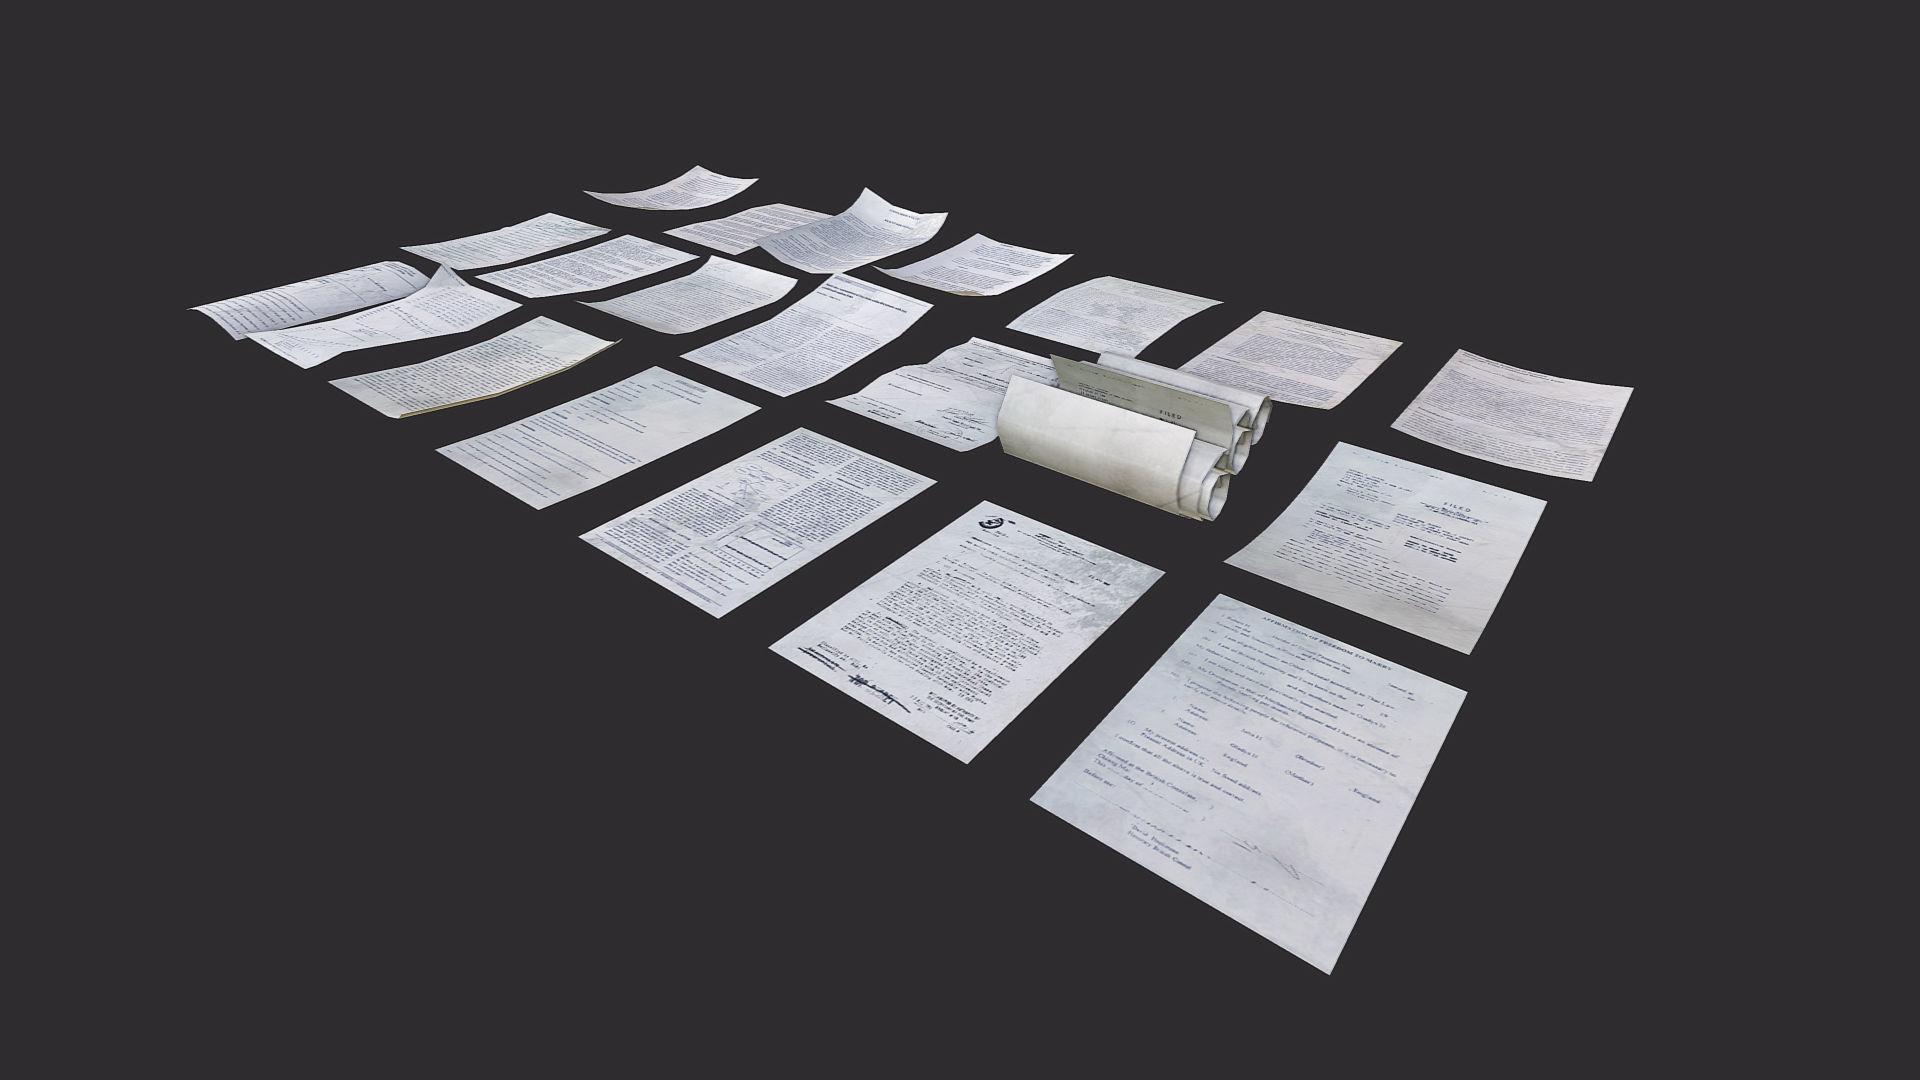 Paper Debris Asset by GamePoly